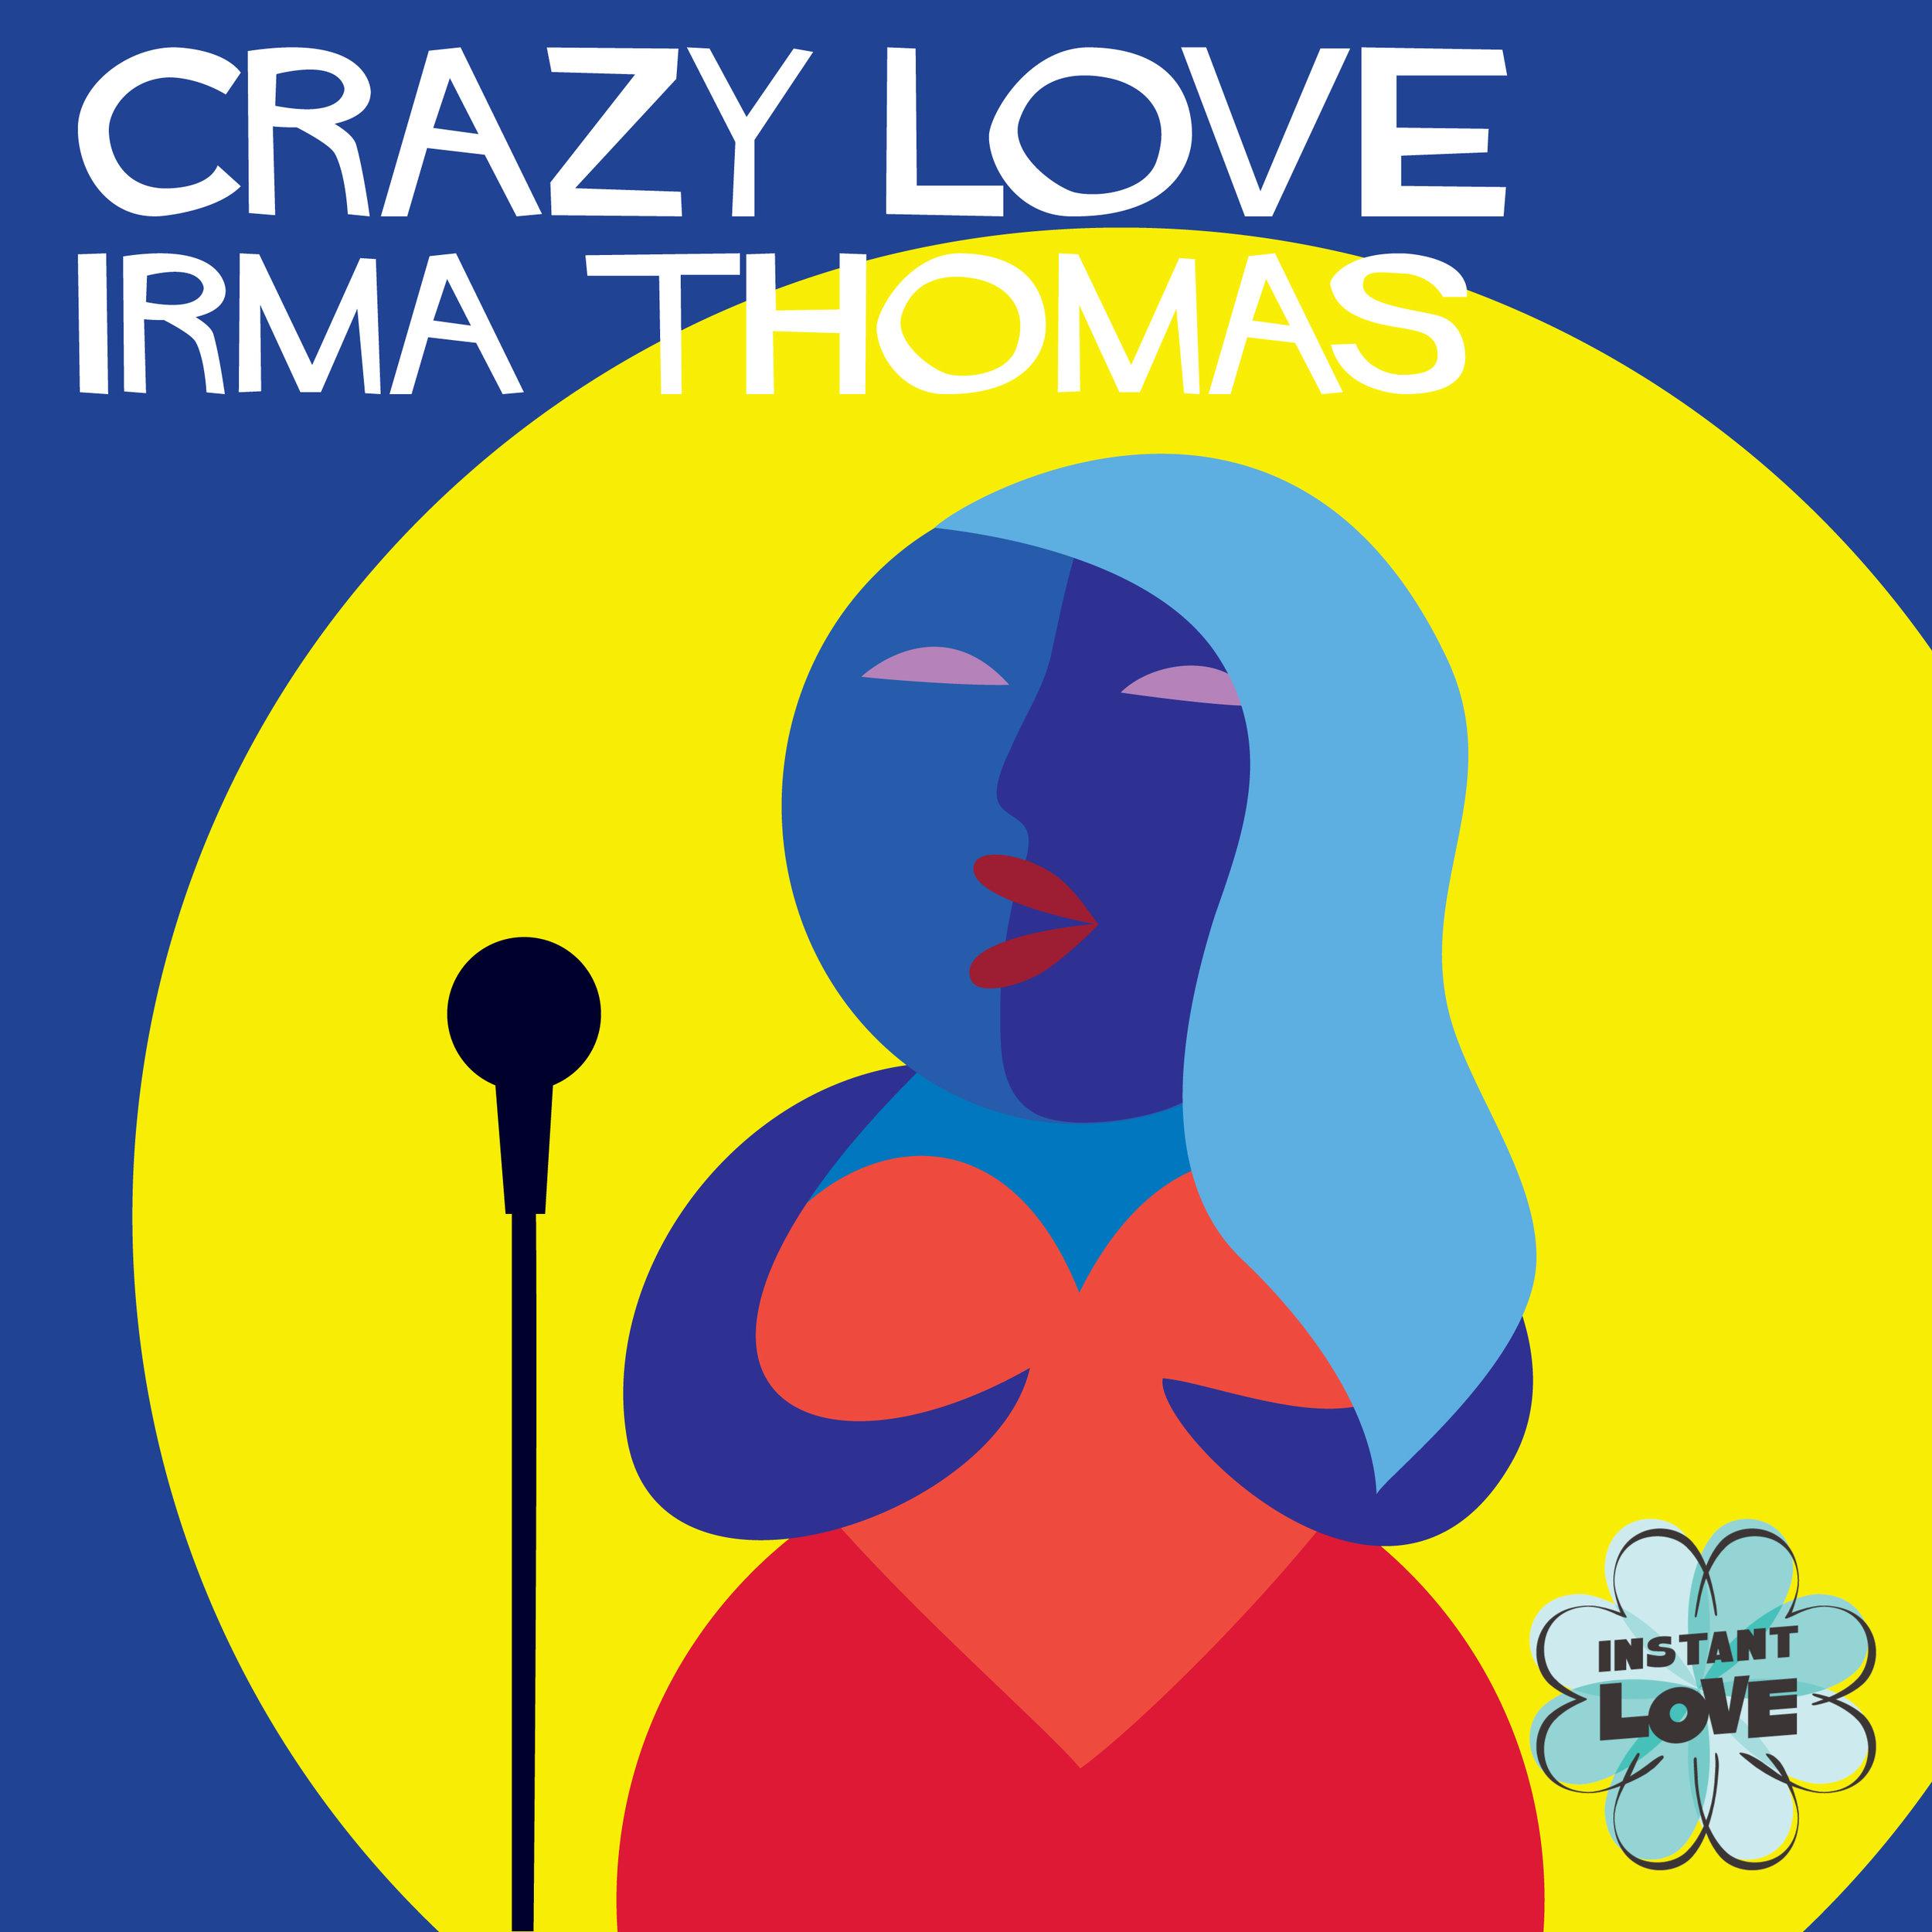 Instant-Love_2_Crazy-Love_FNL_2-26-17.jpg